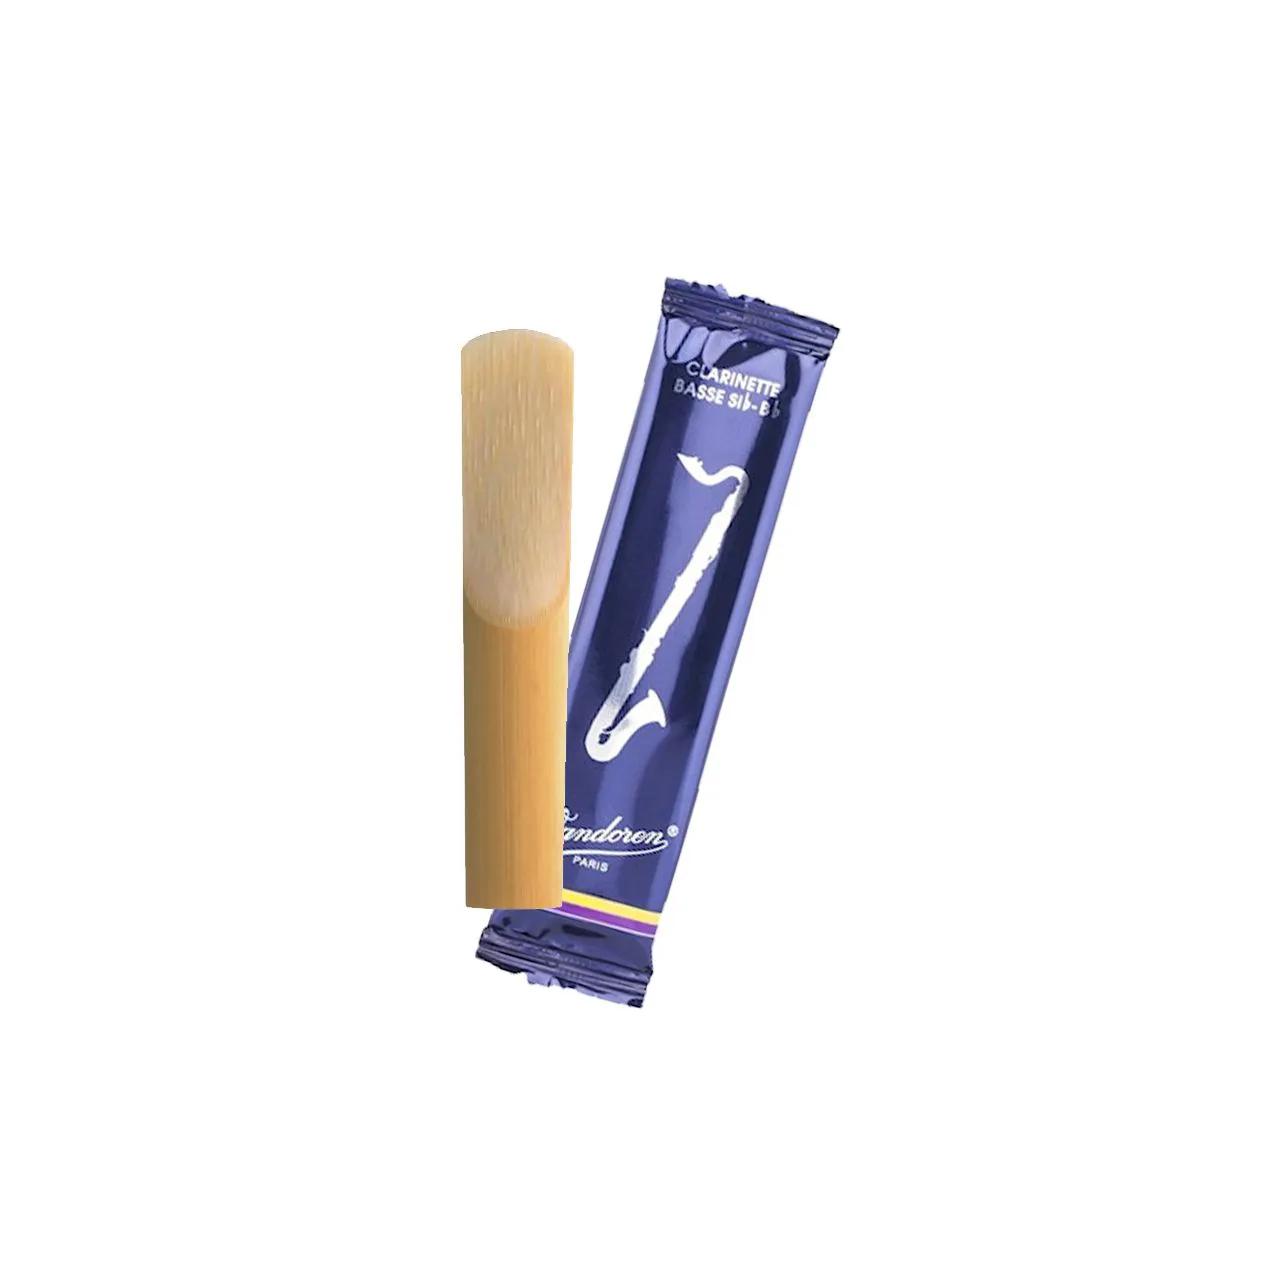 Palheta Tradicional 3,5 P/ Clarinete Baixo Cx C/5 Cr1235 Vandoren